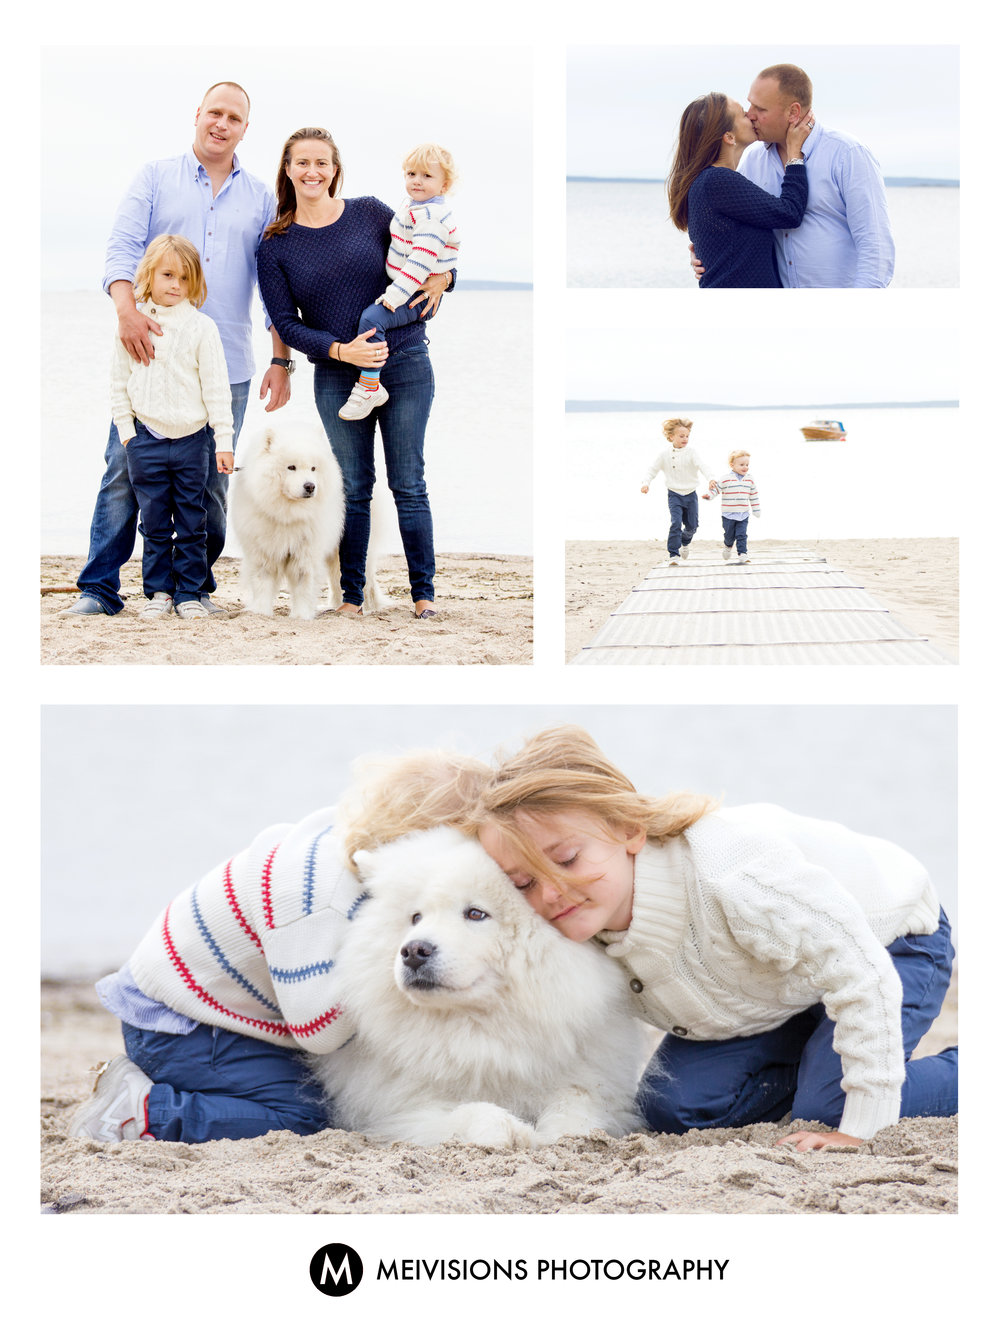 meivisions_familjefotografi_compcard.jpg